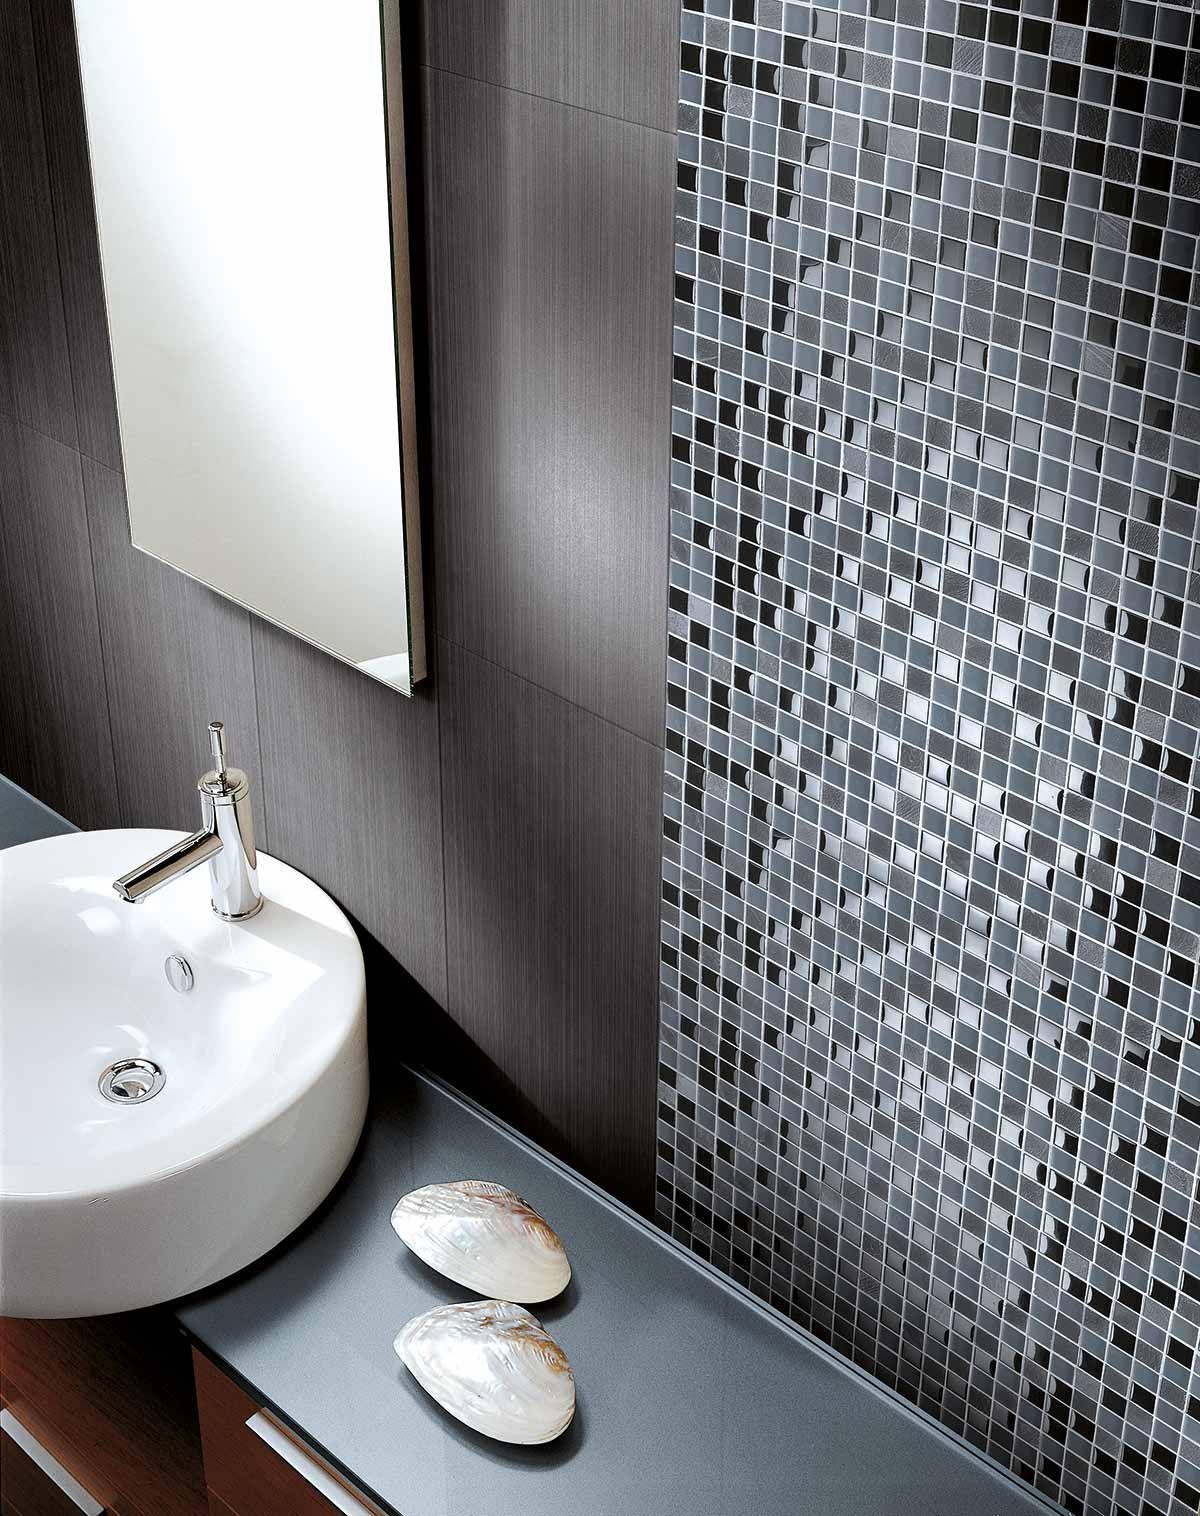 Schwarze Mosaikfliesen Badezimmer Mosaik Mosaikfliesen Mosaik Fliesen Bad